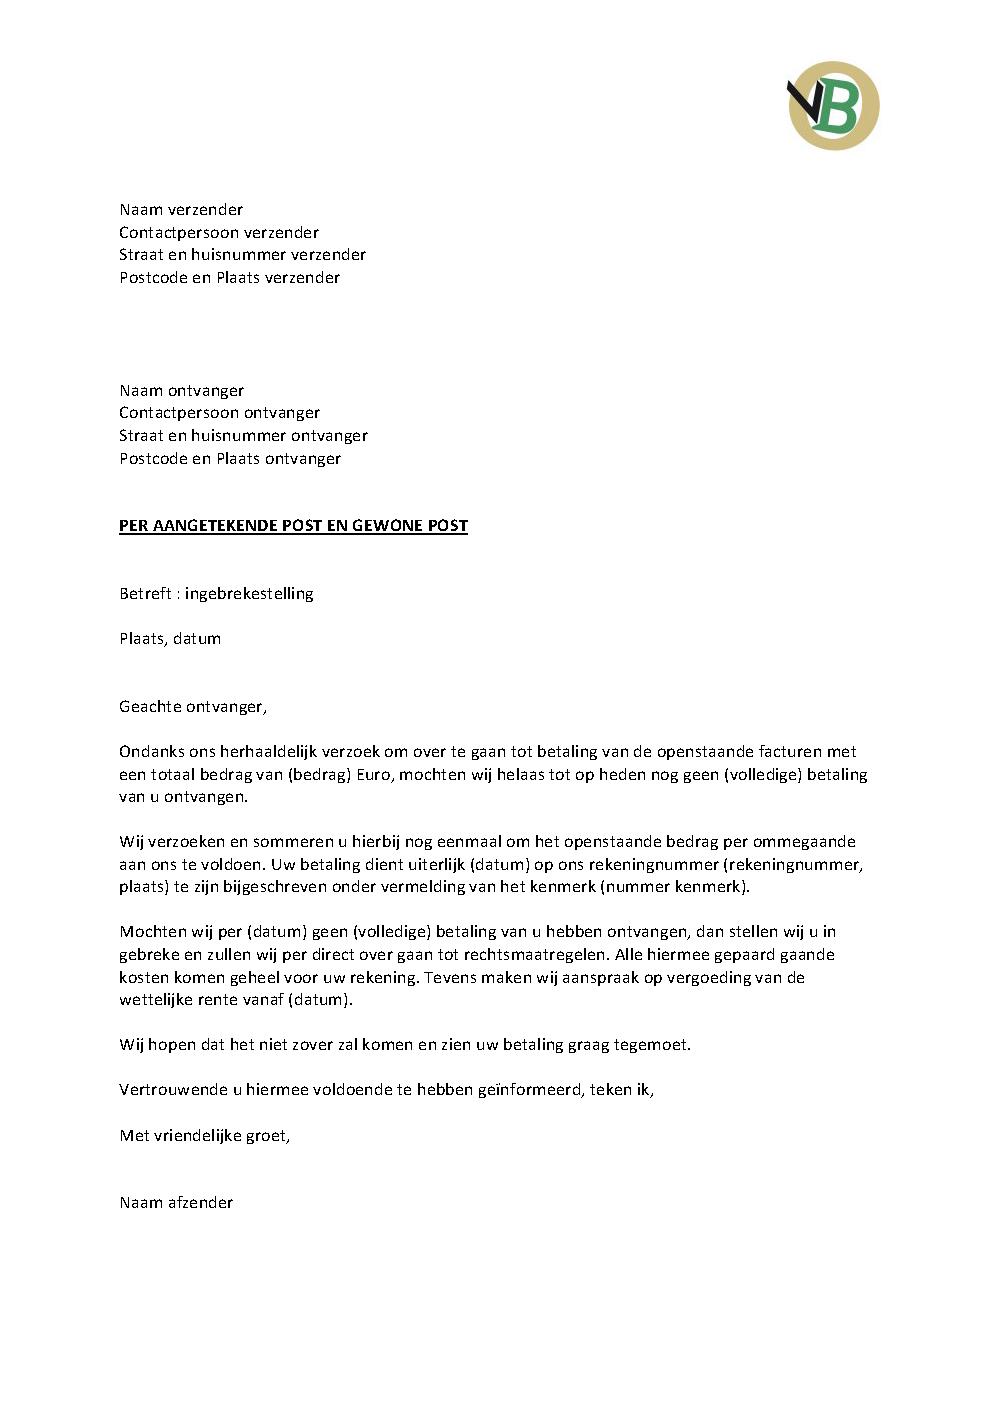 engelse klachtenbrief Engelse Klachtenbrief | hetmakershuis